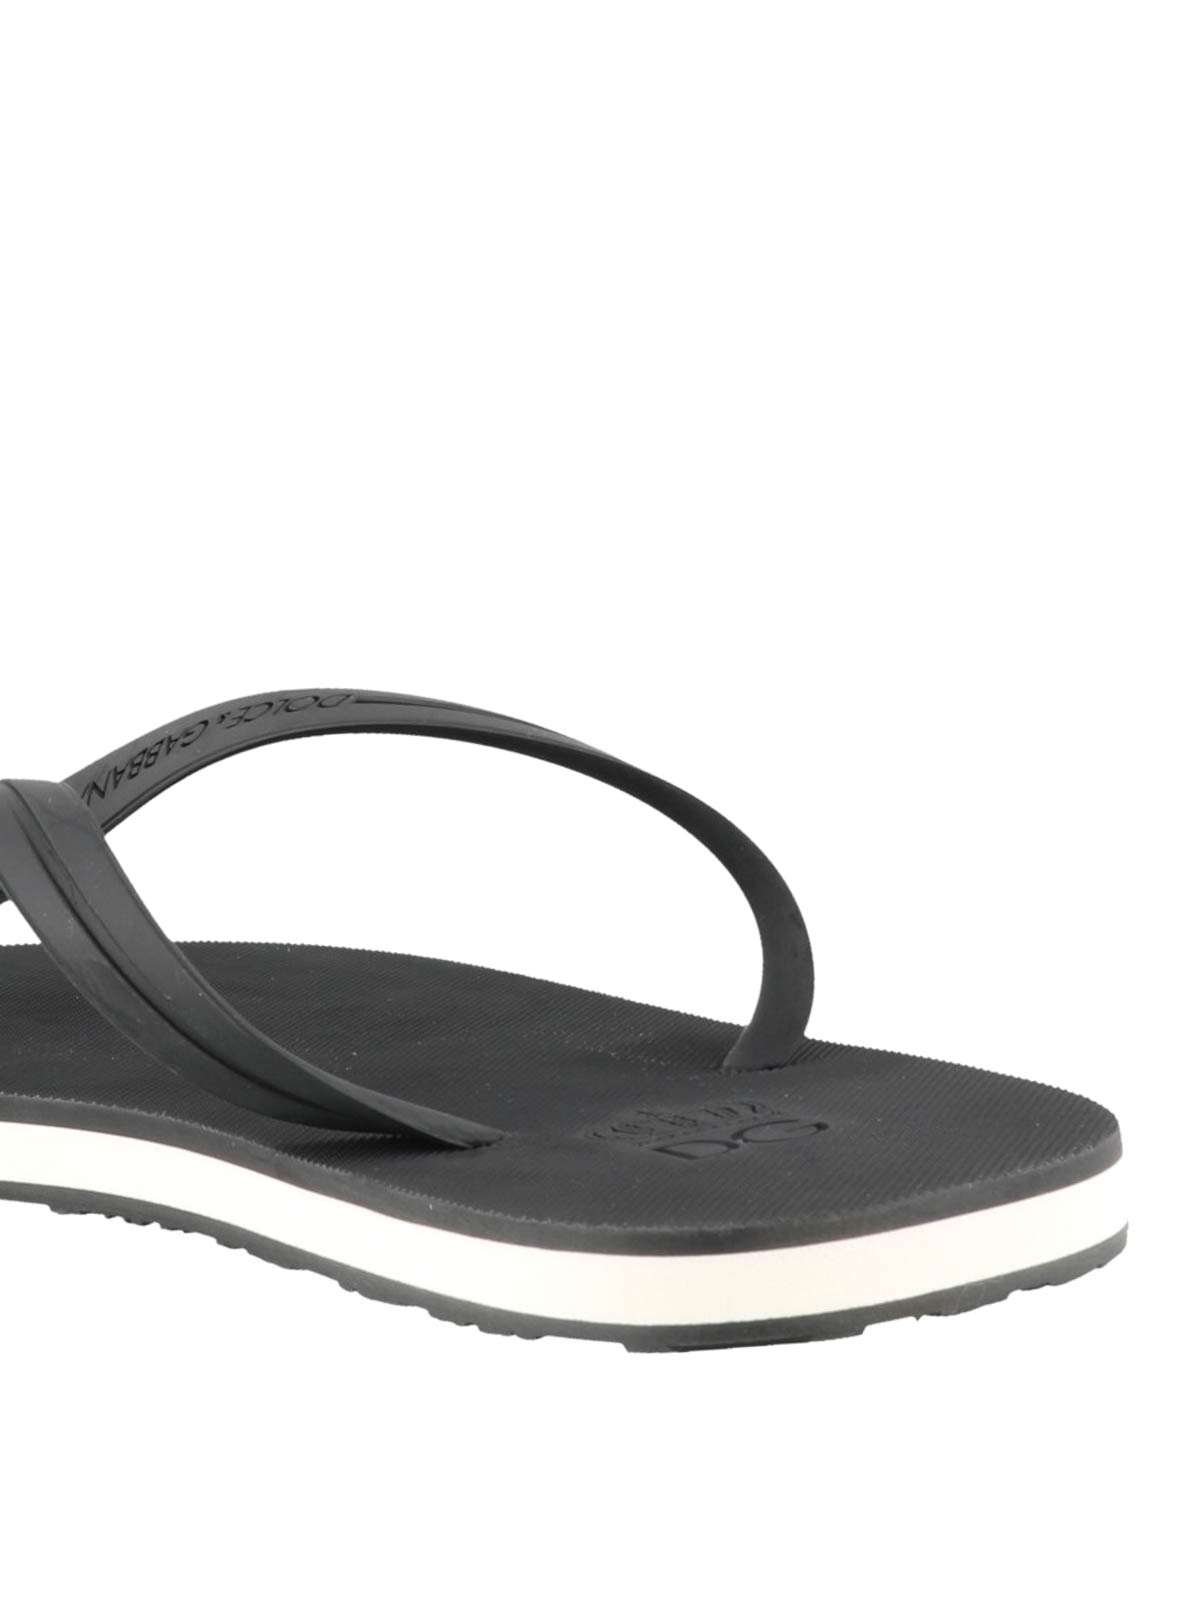 2d529aedcfbc Dolce   Gabbana - Black rubber flip-flop - flip flops - CS1616 ...